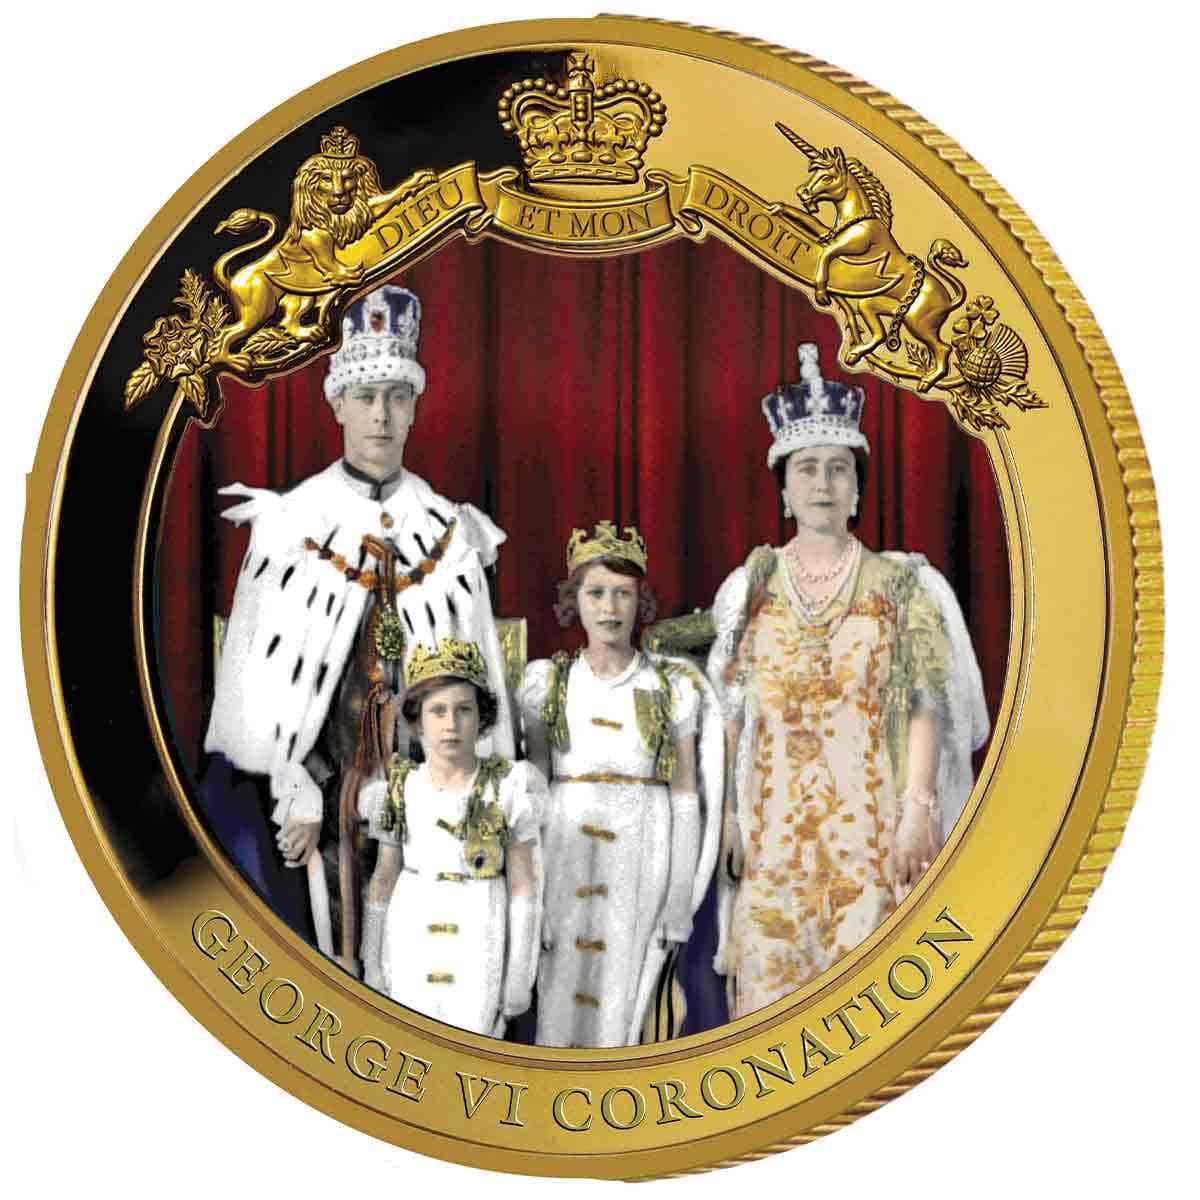 George VI Coornation